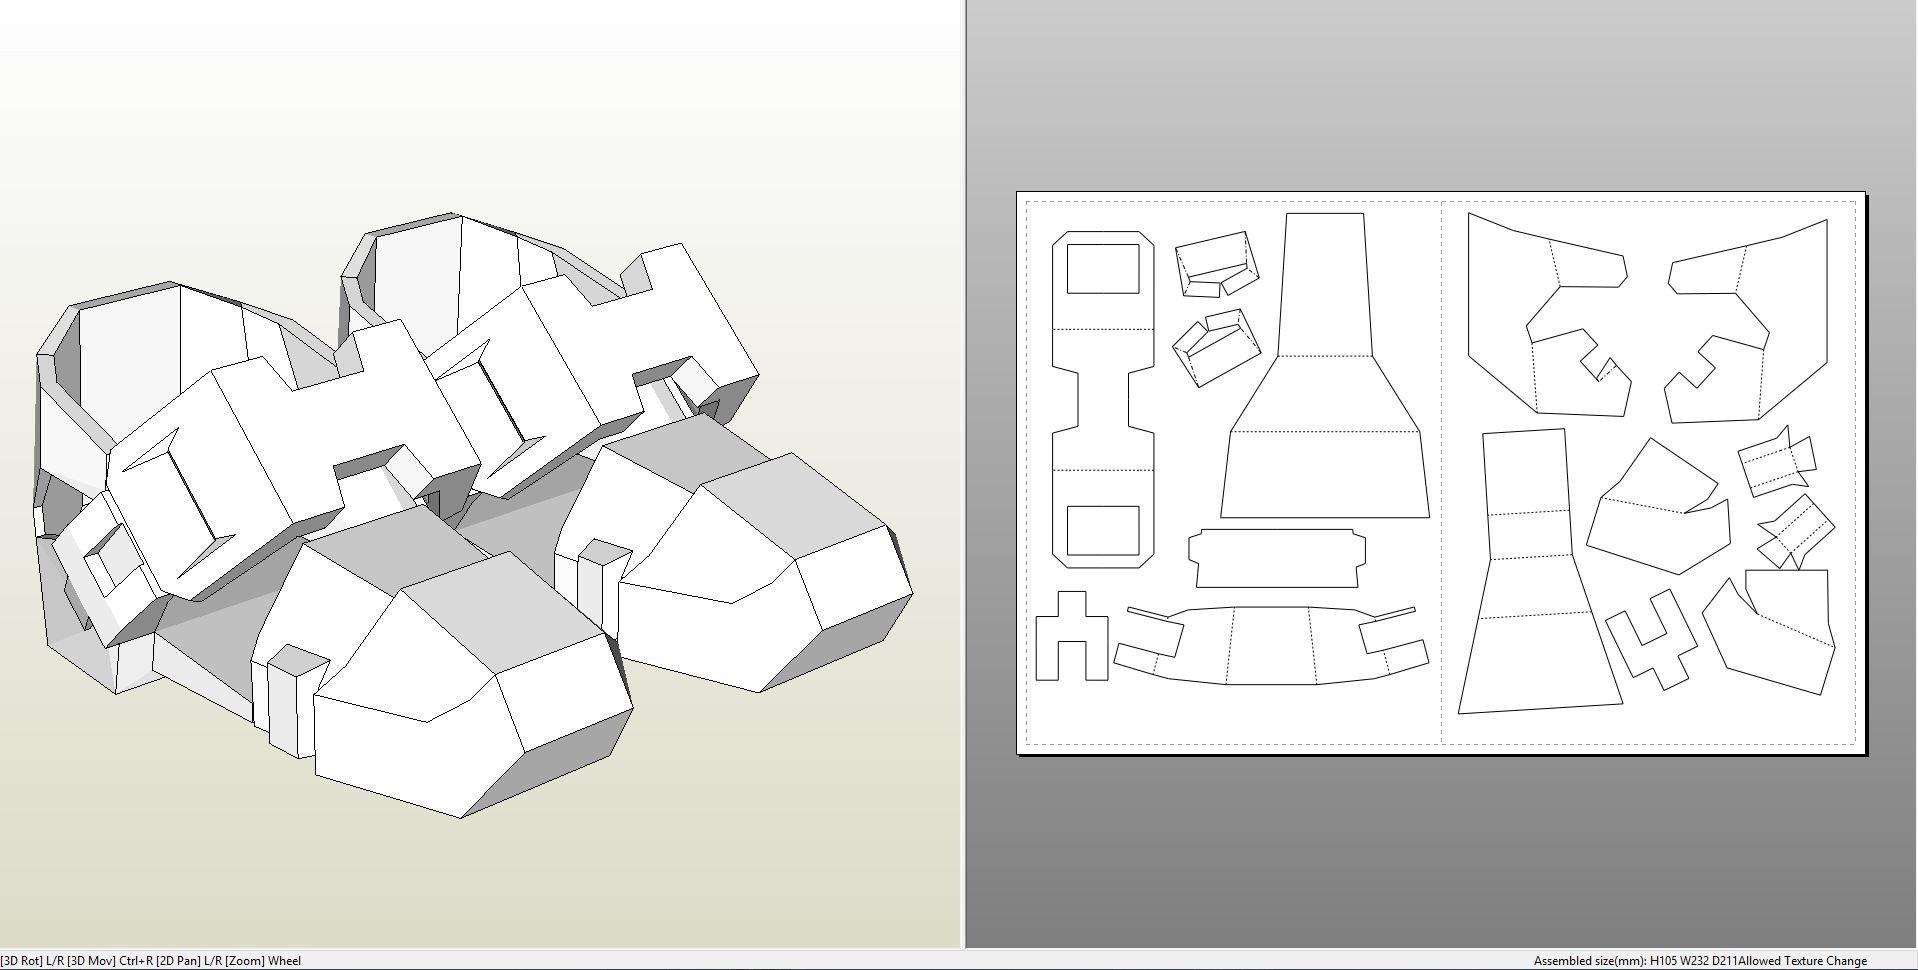 Halo Odst Foam Armor Templates Foamcraft Pdo File Template for Halo 4 forward Unto